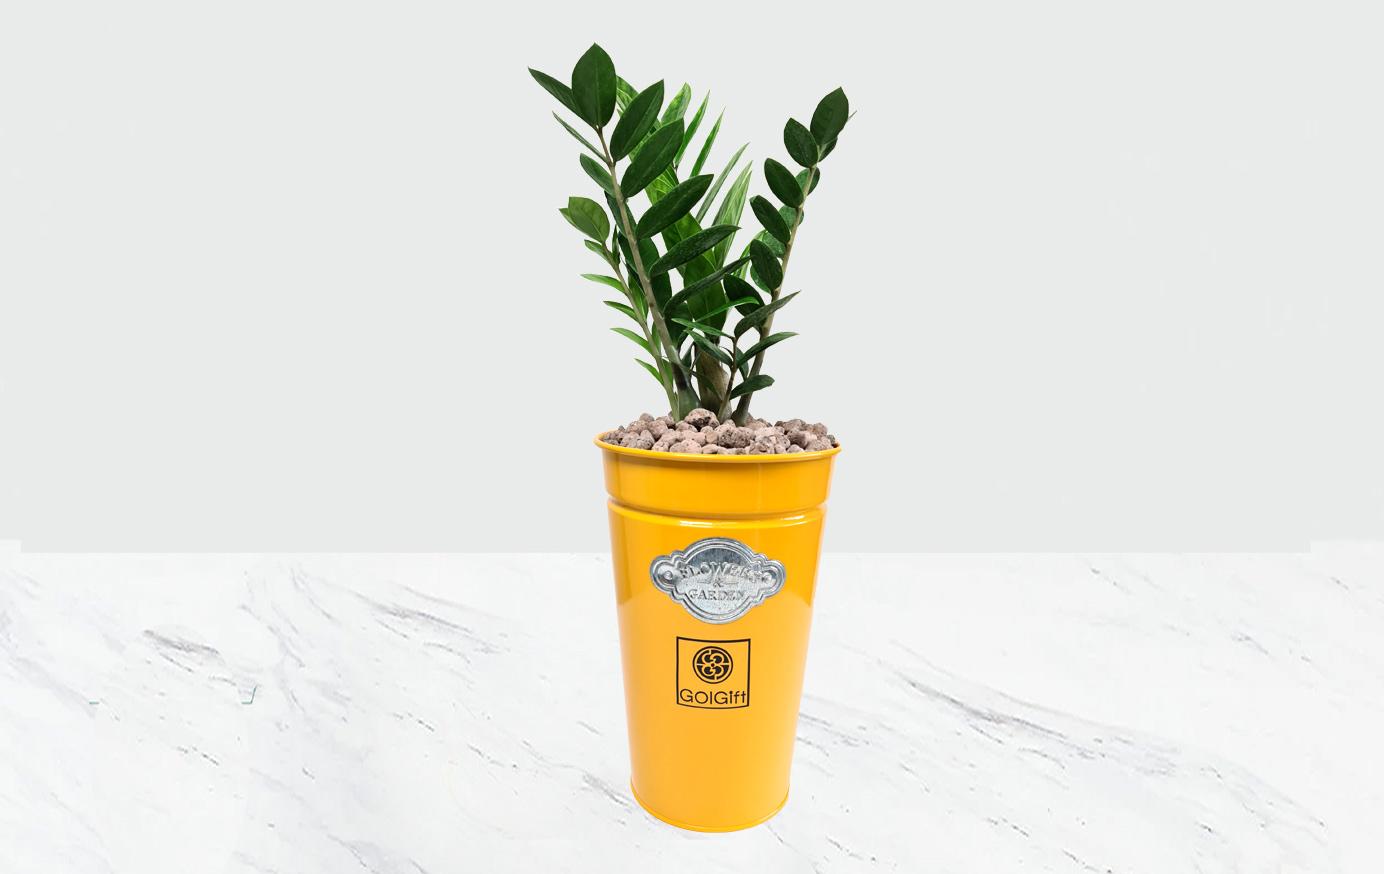 گلدان زرد زامیفولیا